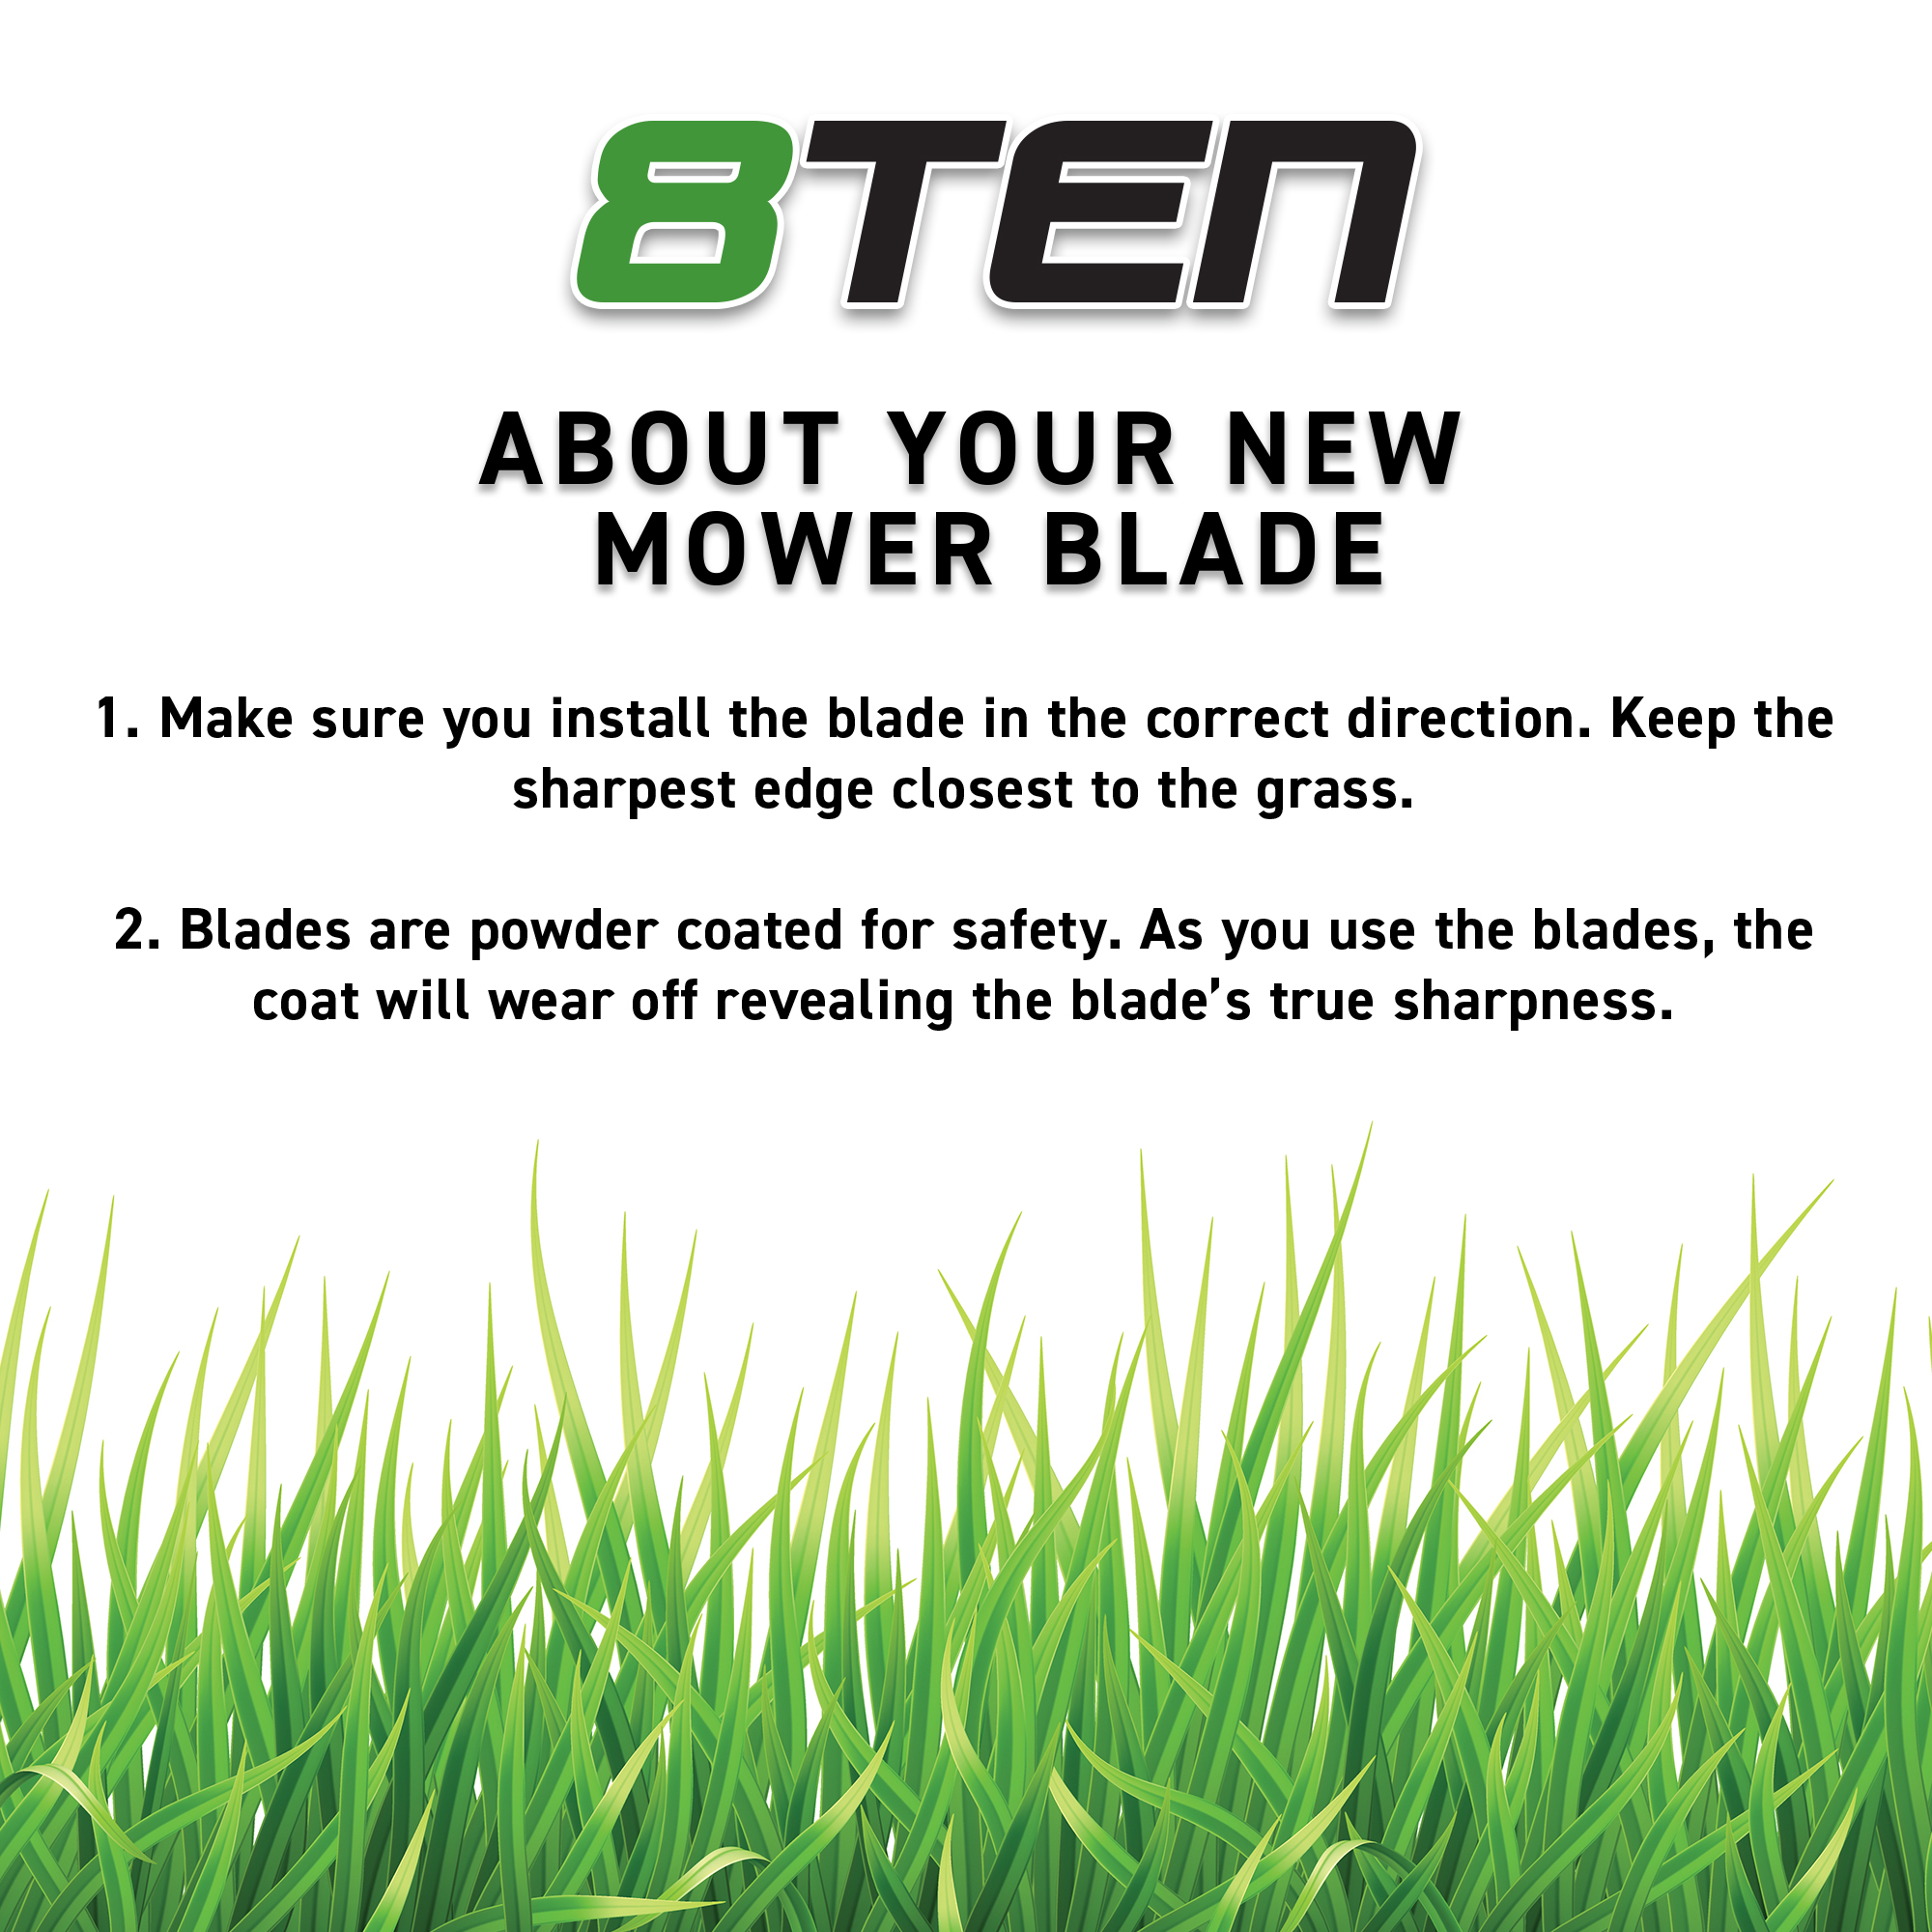 8TEN Mower Blade Toro 14-1659 14-9419 75-9420 91-2256 91-2256-03 Hi-Lift 3 Pack